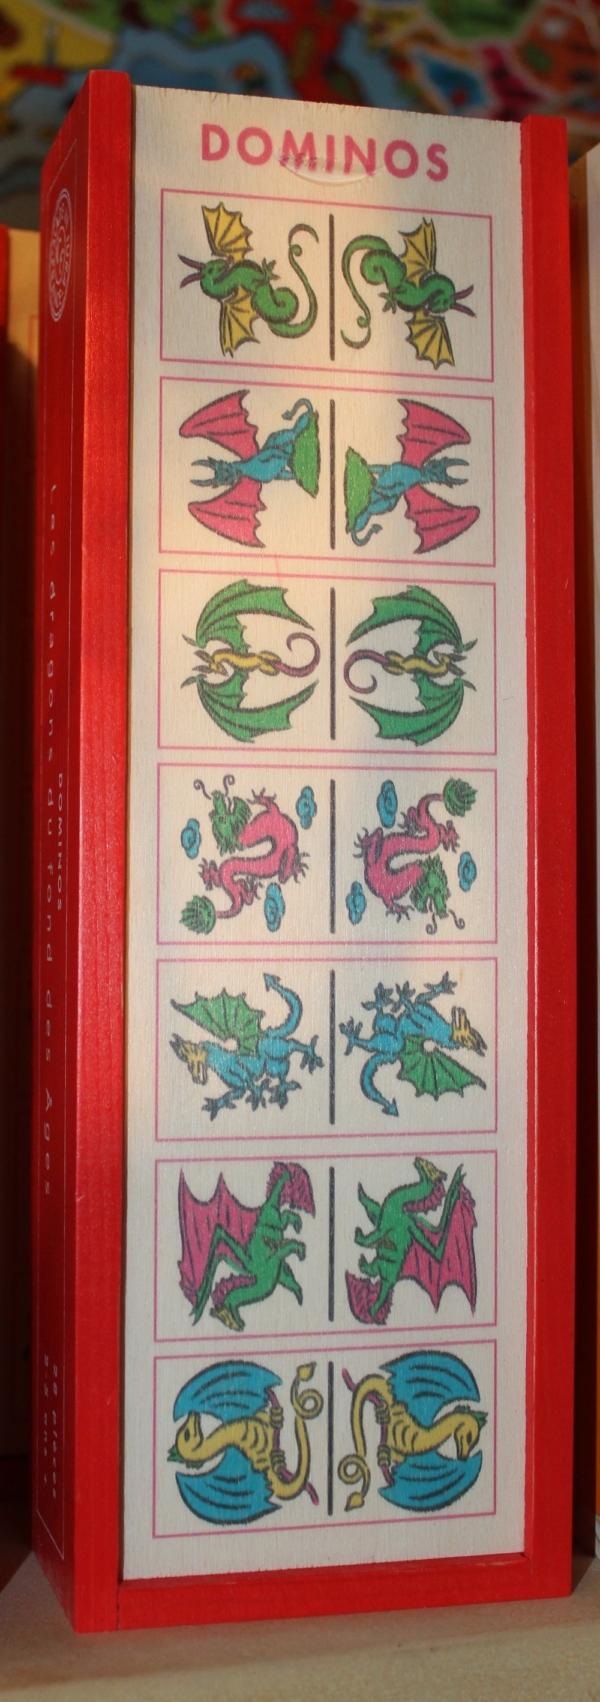 Dominos Dragons